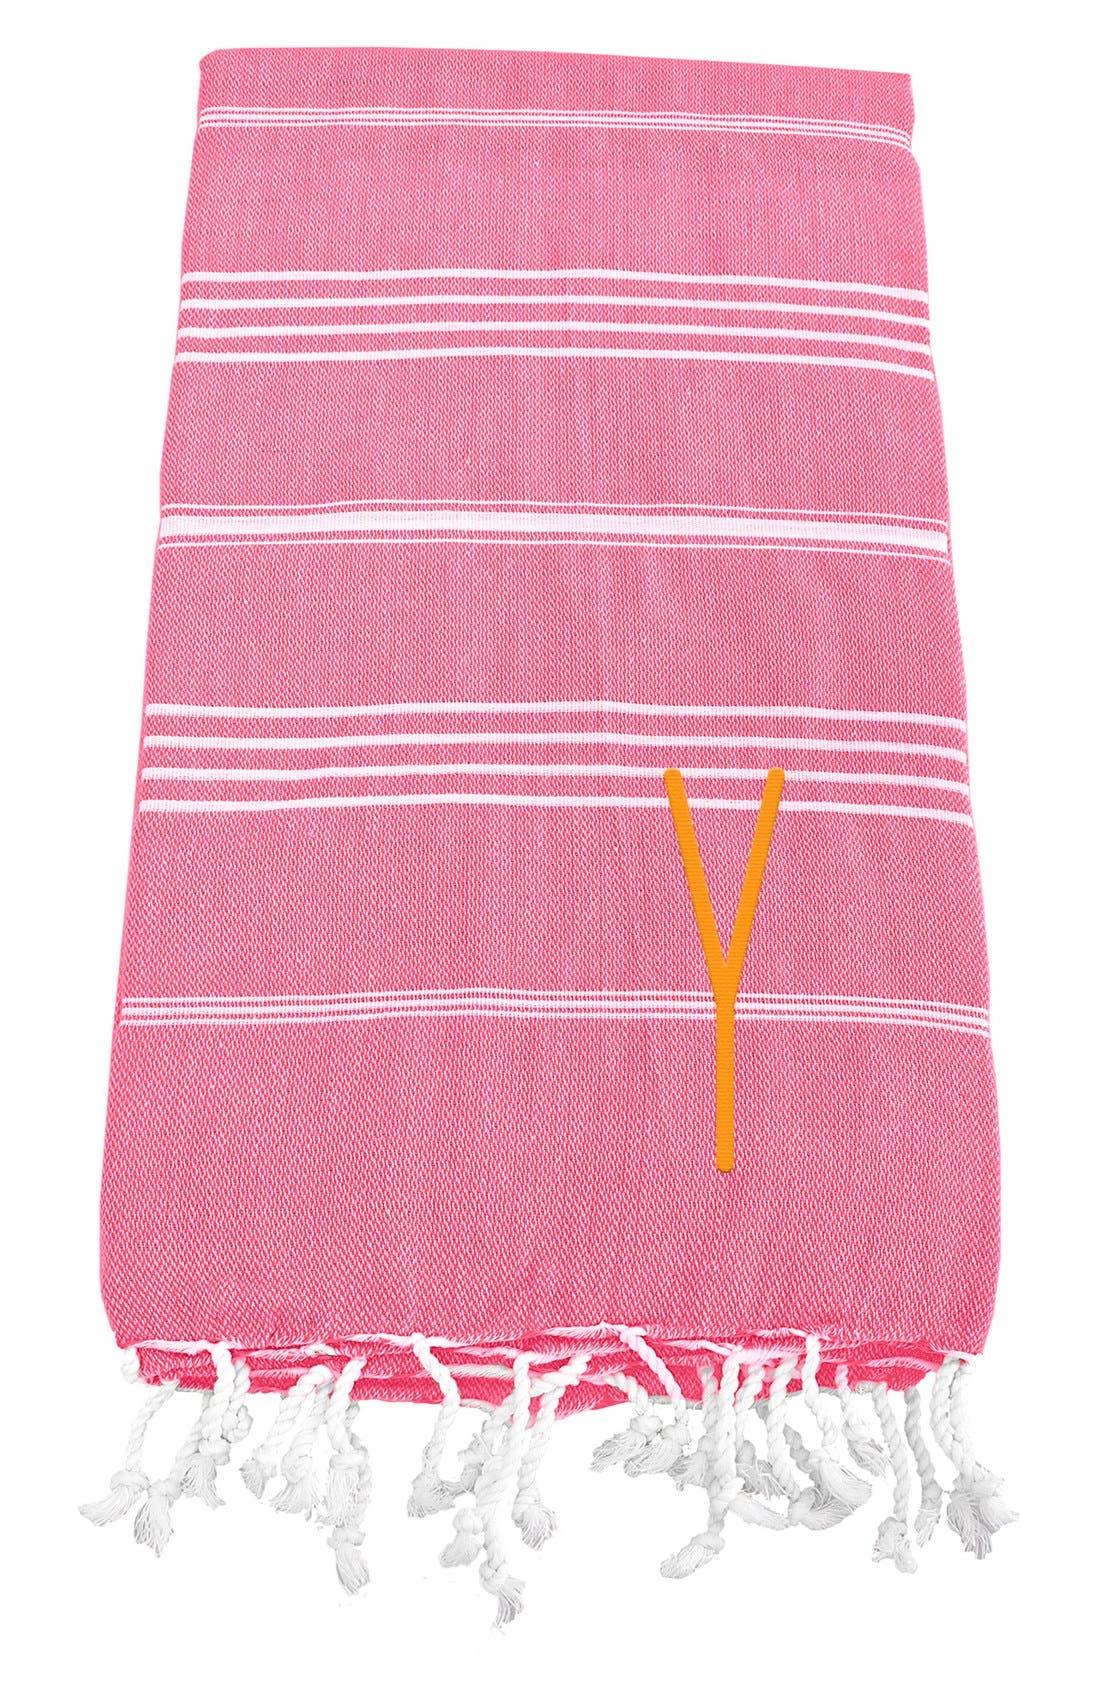 Monogram Turkish Cotton Towel,                             Main thumbnail 161, color,